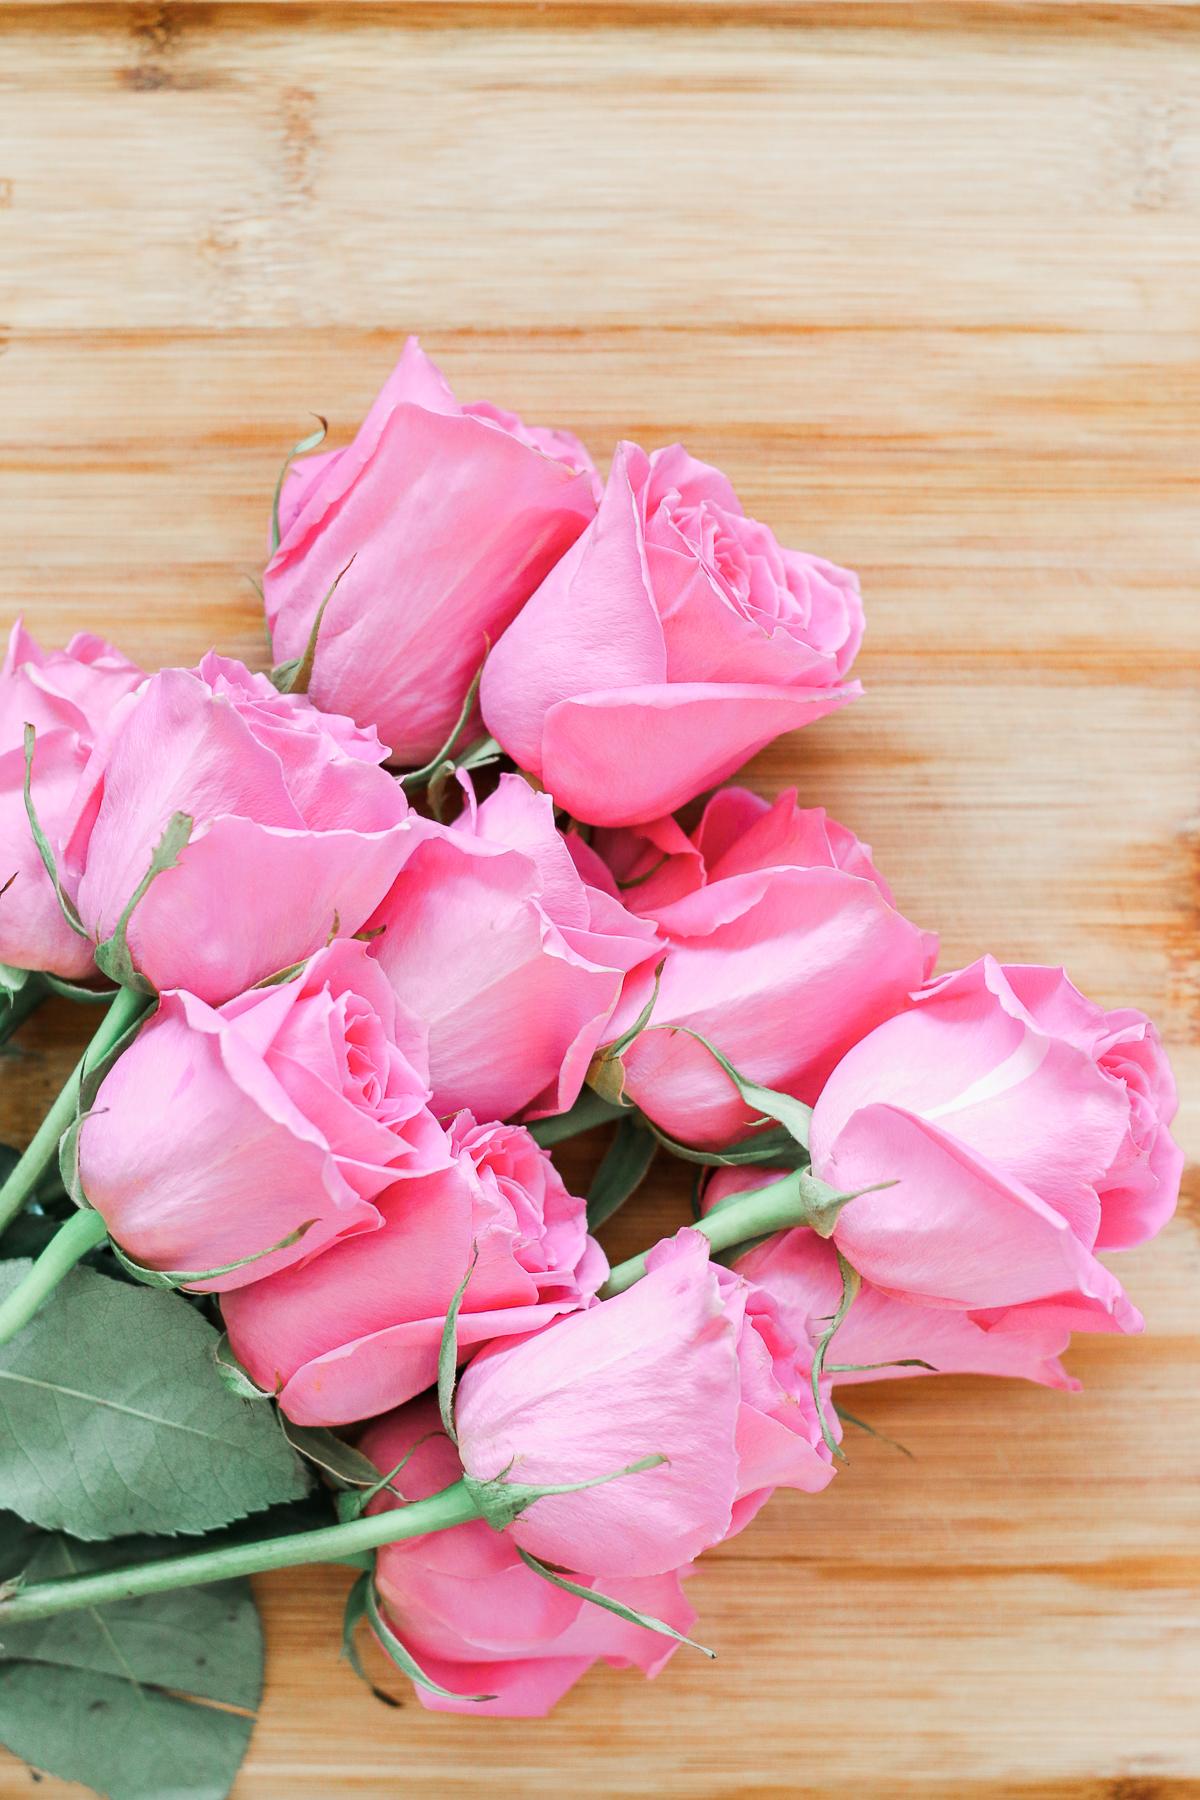 DIY rose sugar scrub recipe made with white sugar, coconut oil, rose essential oil, and fresh rose petals by southern blogger Stephanie Ziajka from Diary of a Debutante, DIY sugar scrub recipe, diy sugar body scrub, diy sugar scrub gift, best diy sugar scrub